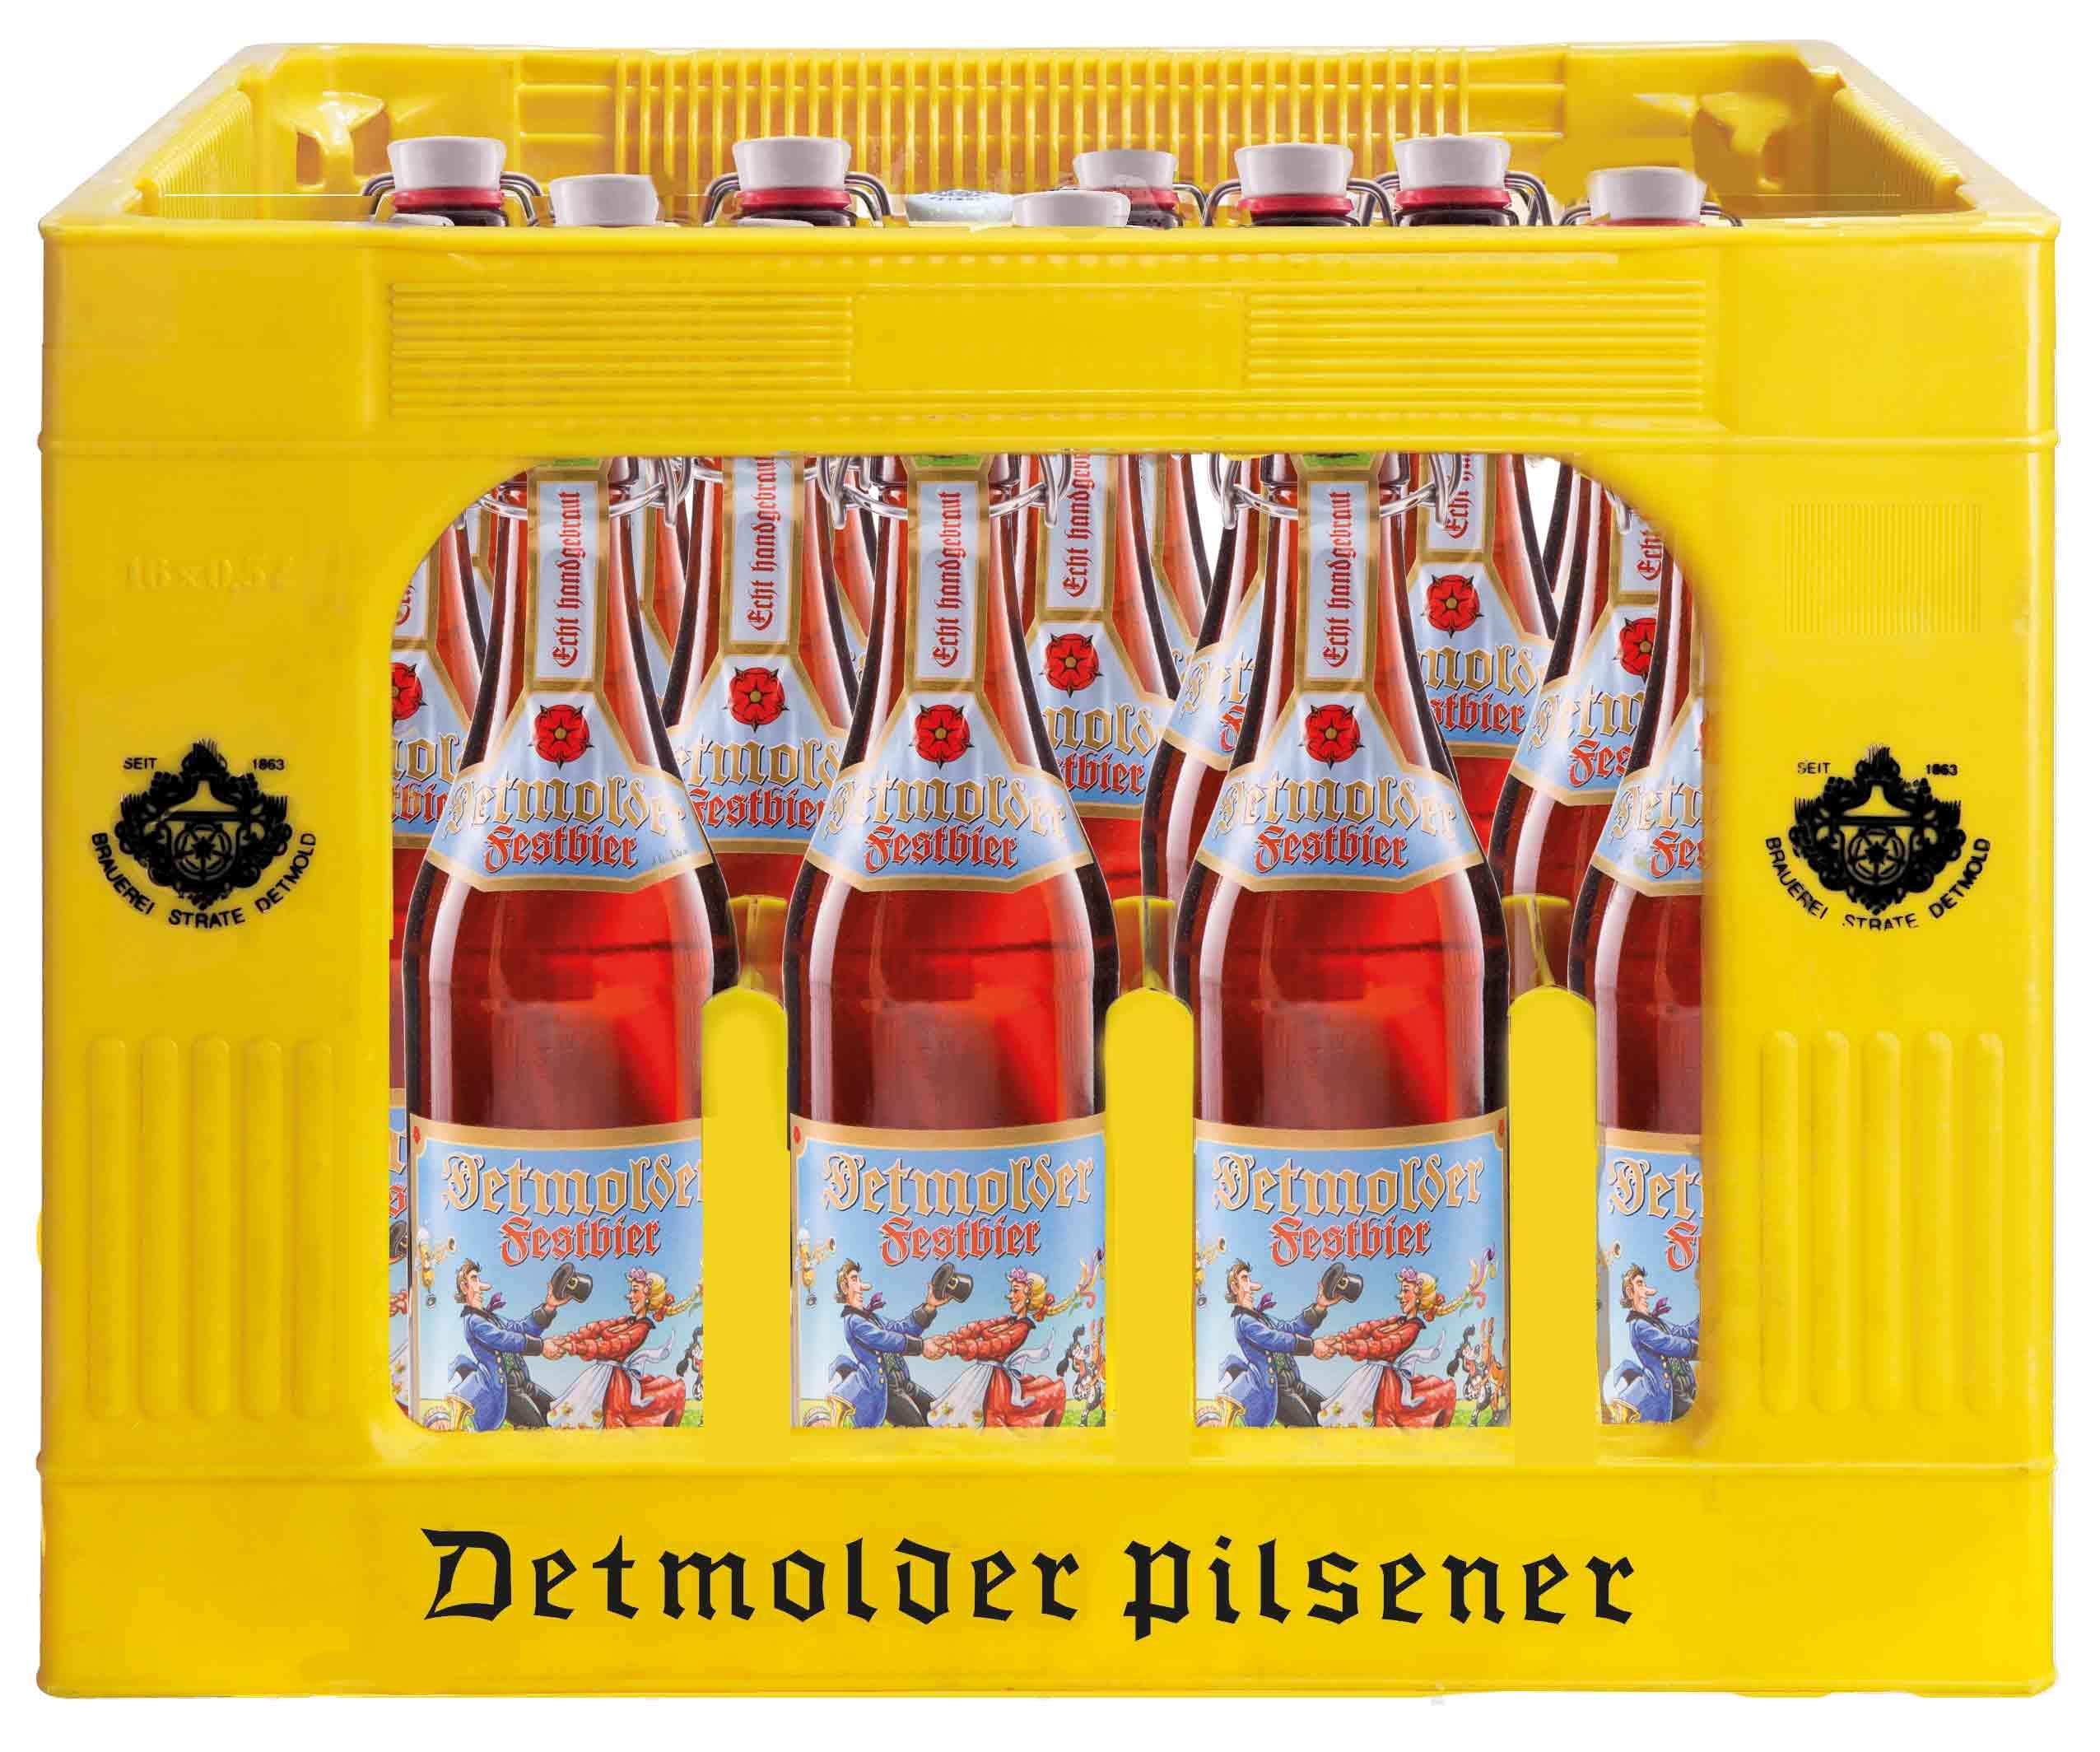 Detmolder Festbier Kasten Image